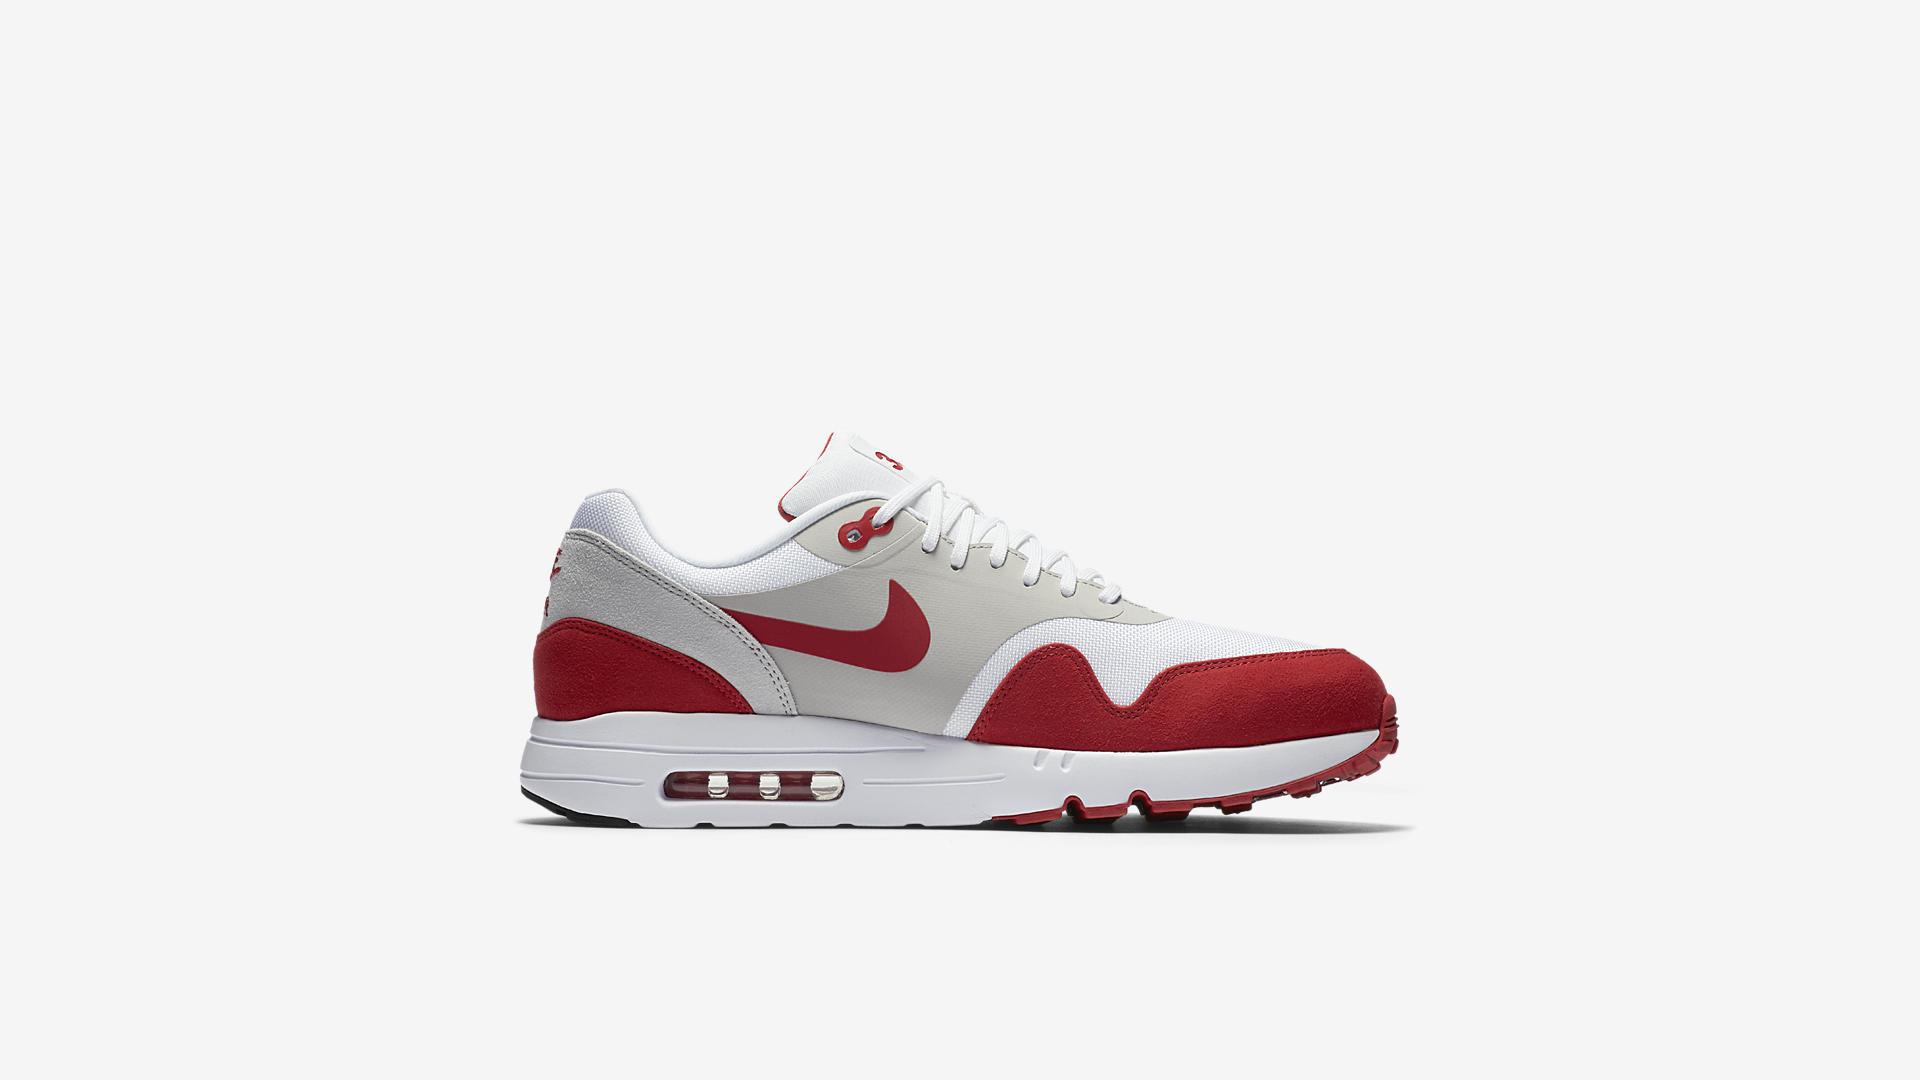 237b4ed2d6 1920x1080 Nike Air Max 1 Ultra 2.0 OG · Download · 1920x1080